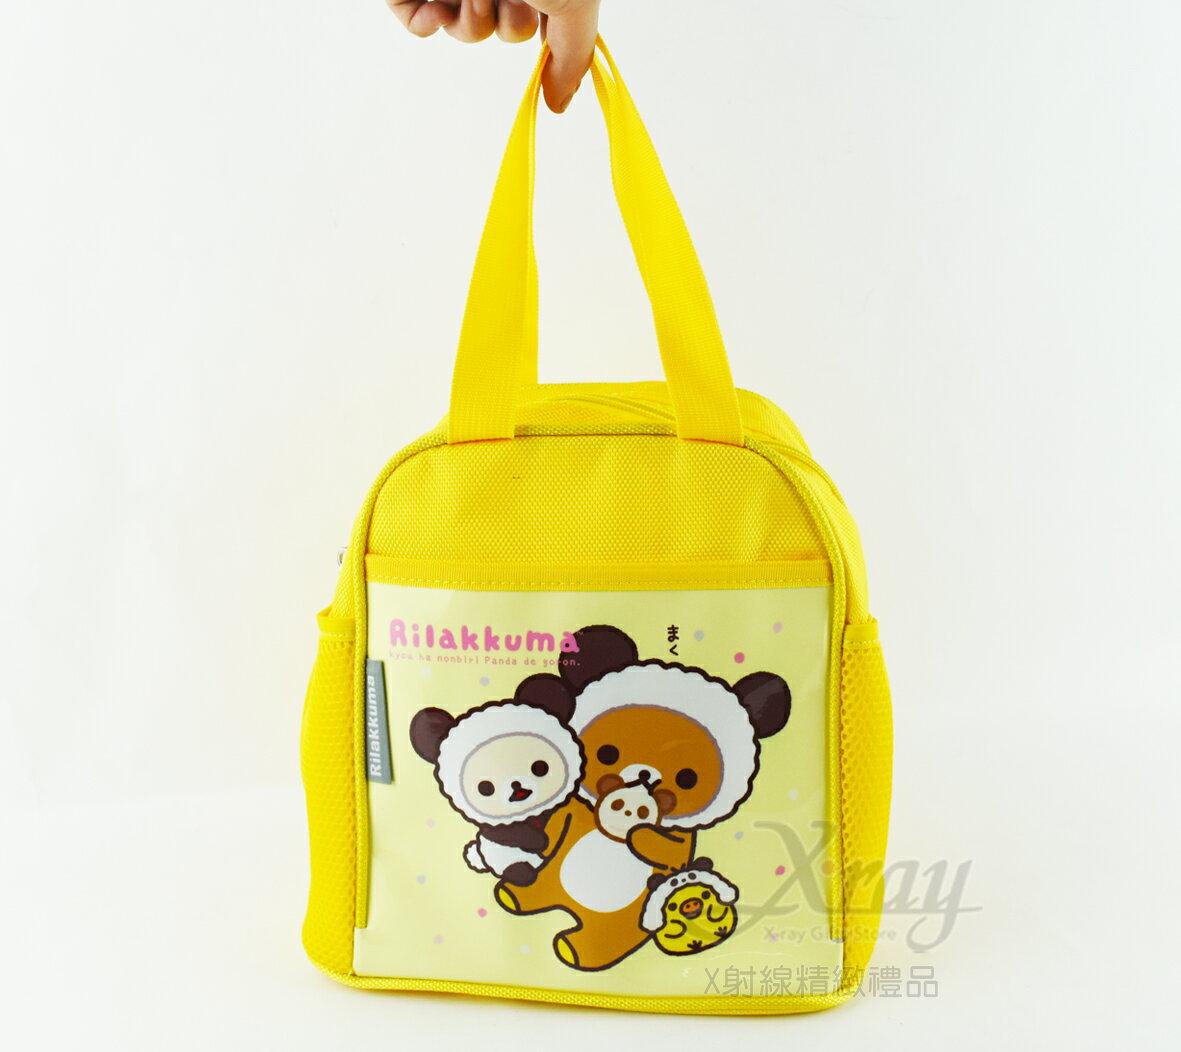 X射線【C206908】拉拉熊便當袋-熊貓(黃),書袋/購物袋/便當袋/手提袋/開學必備/補習袋